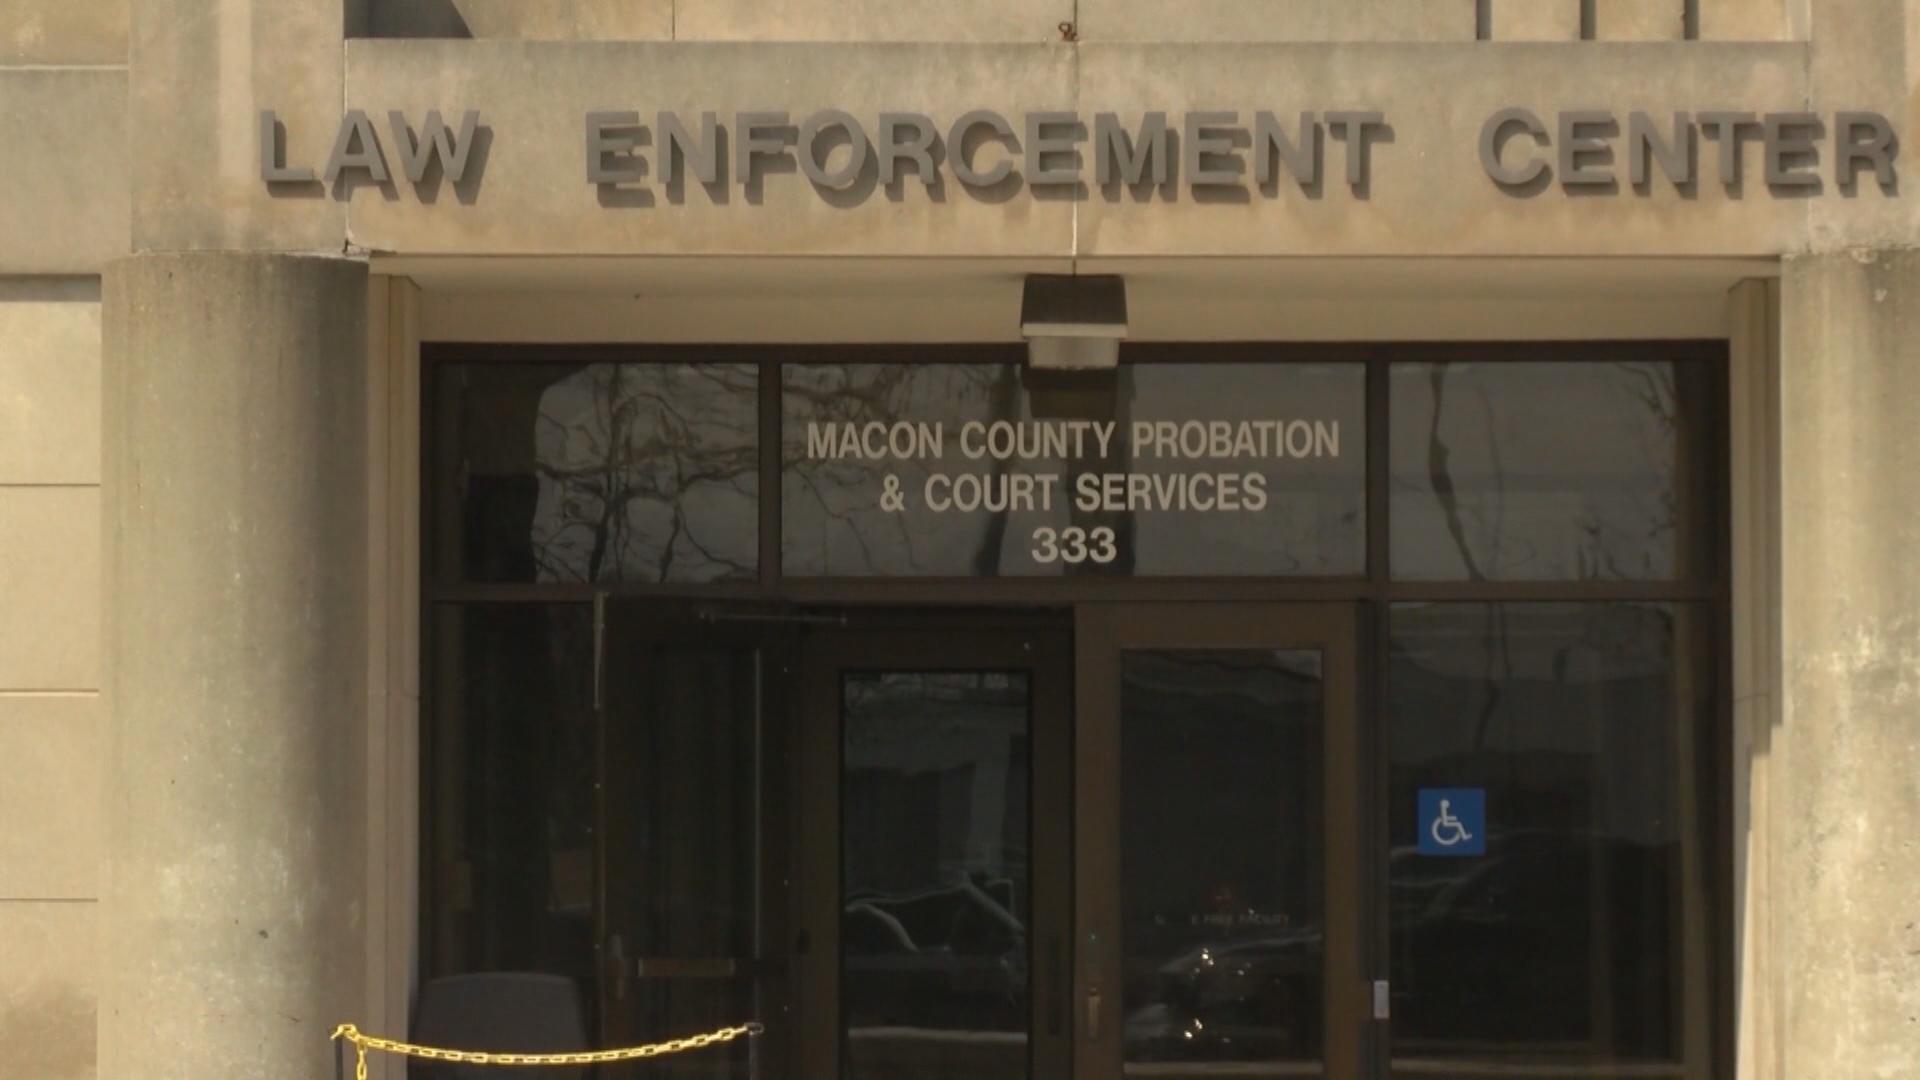 macon county law enforcement center (1)_1554931634627.jpg.jpg